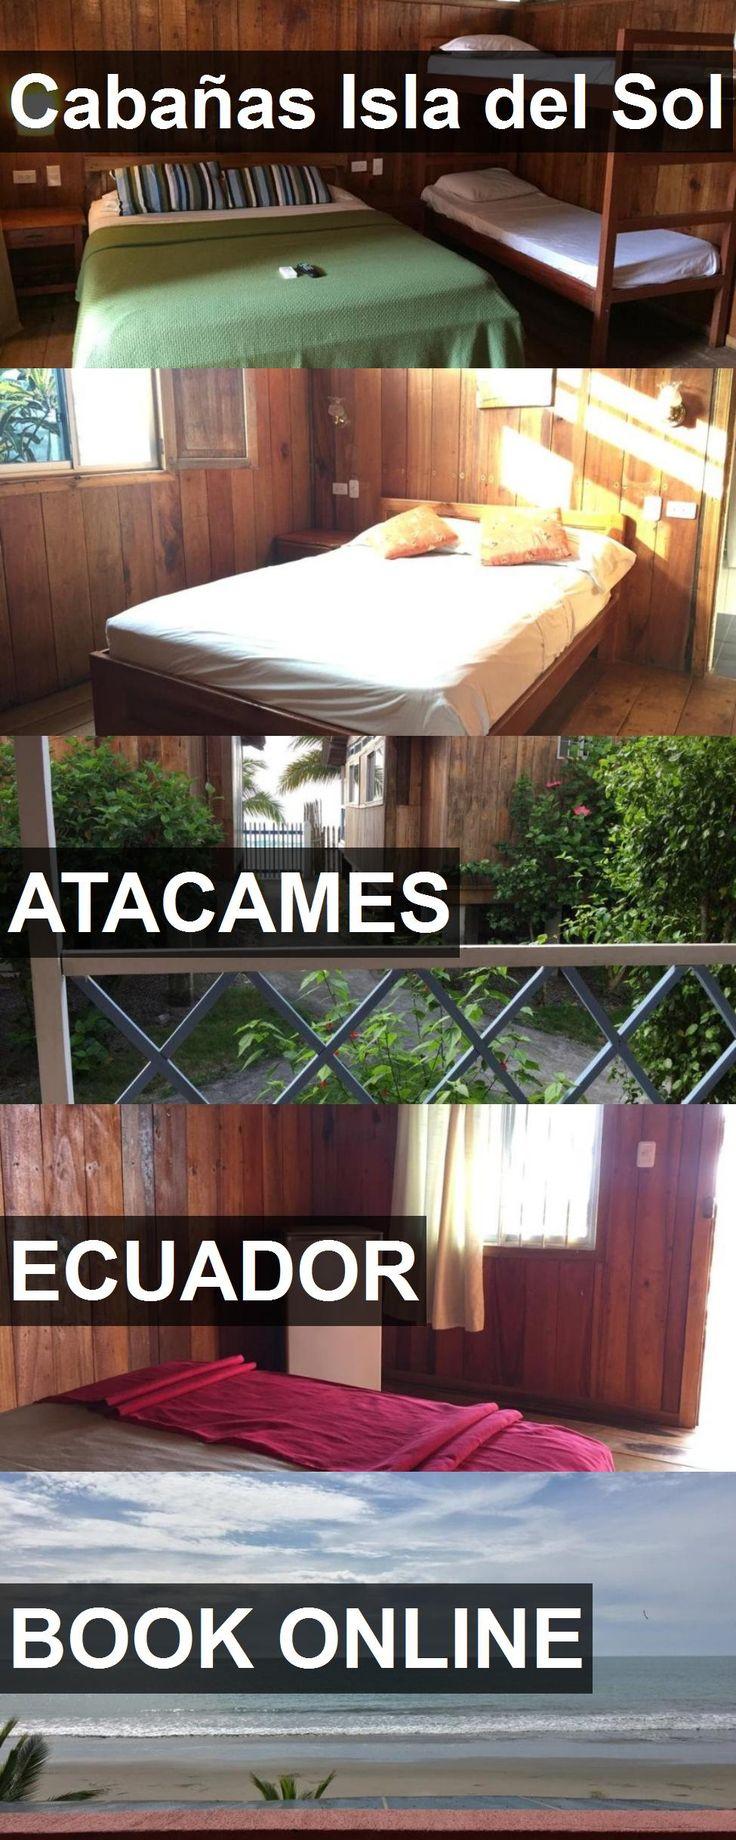 Hotel Cabañas Isla del Sol in Atacames, Ecuador. For more information, photos, reviews and best prices please follow the link. #Ecuador #Atacames #hotel #travel #vacation